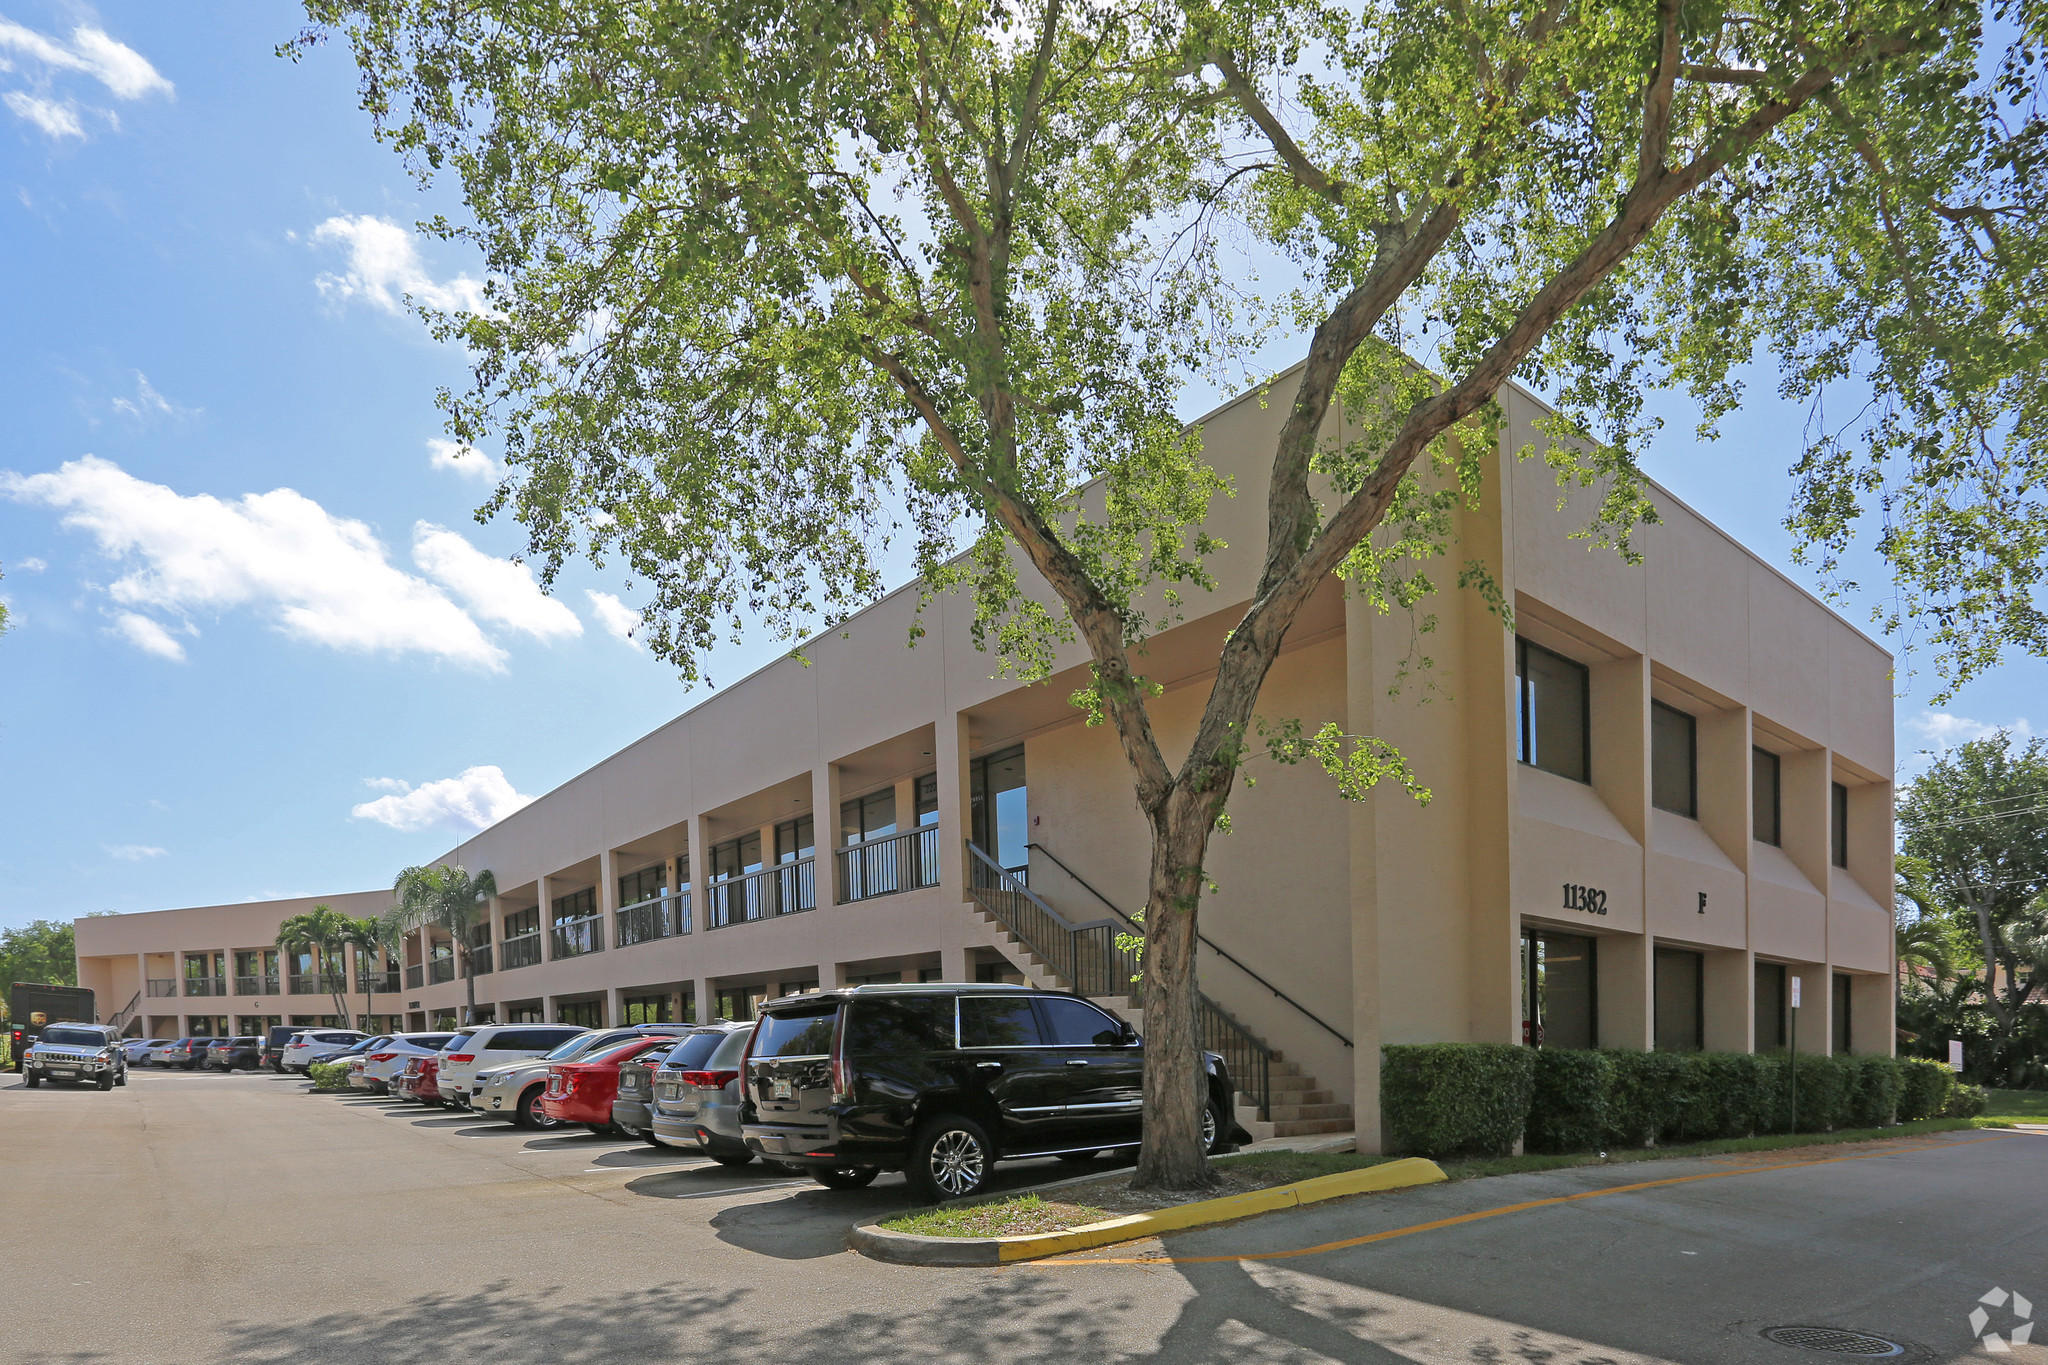 11382 Prosperity Farms Unit 224, Palm Beach Gardens, Florida 33410